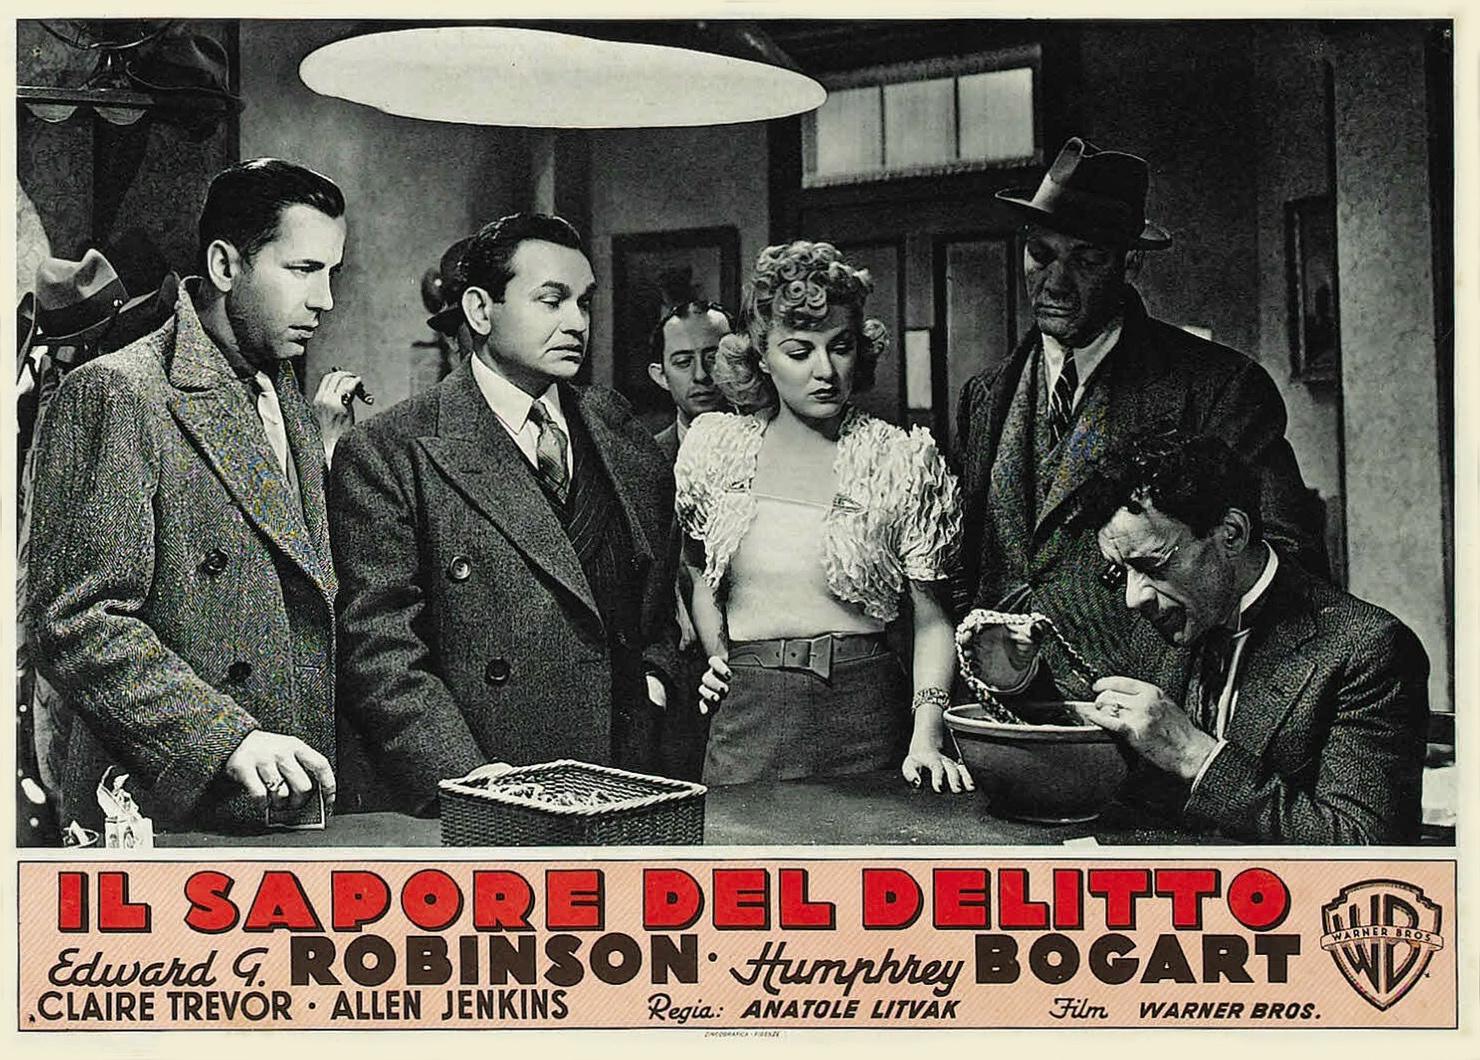 Humphrey Bogart, Edward G. Robinson, Thurston Hall, Allen Jenkins, and Claire Trevor in The Amazing Dr. Clitterhouse (1938)